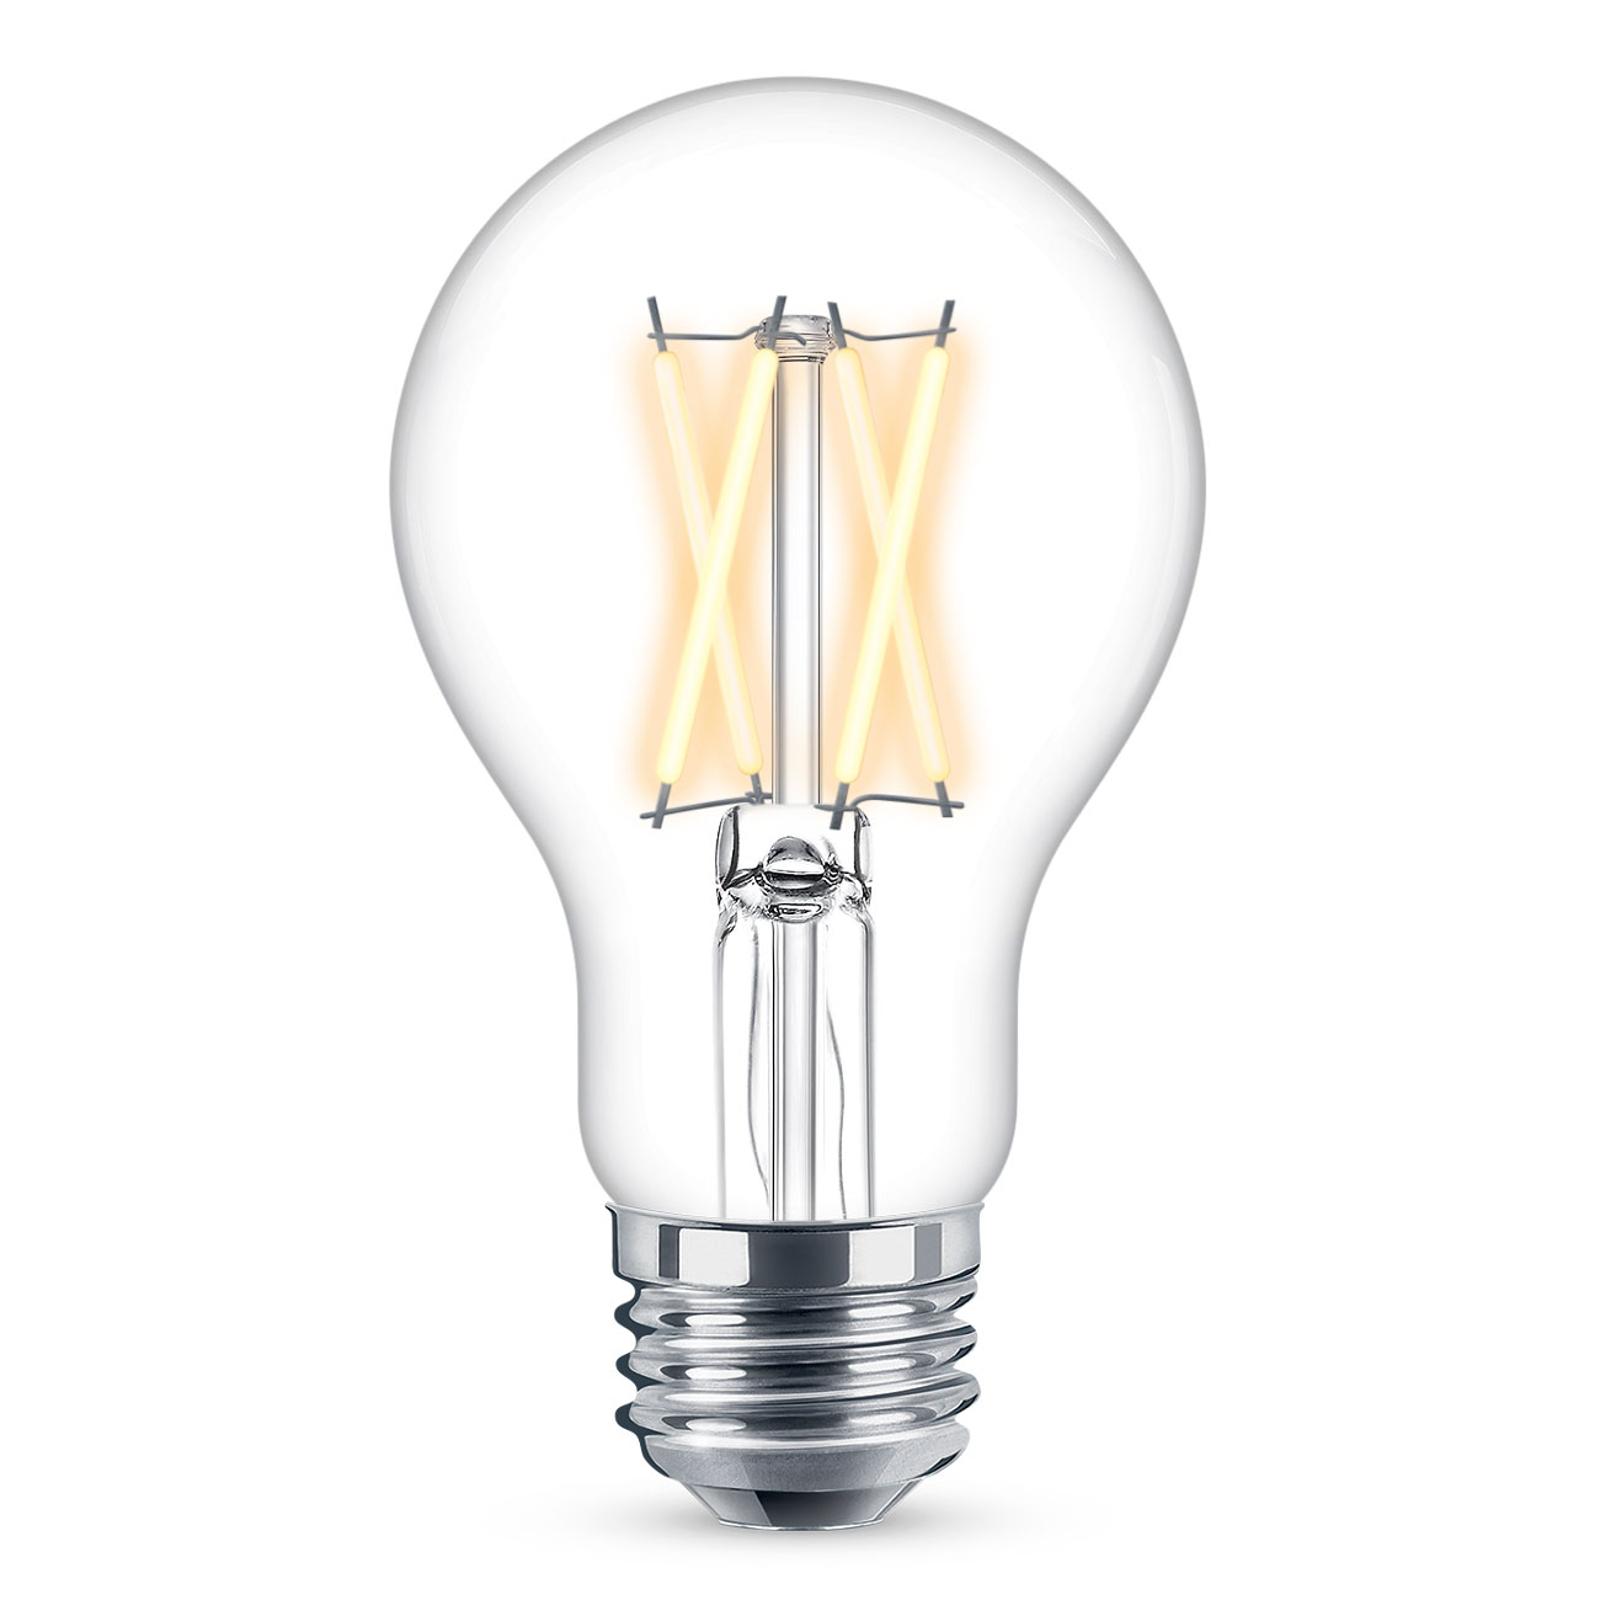 WiZ E27 LED A60 filament transp. 6,5W 2200-5500K